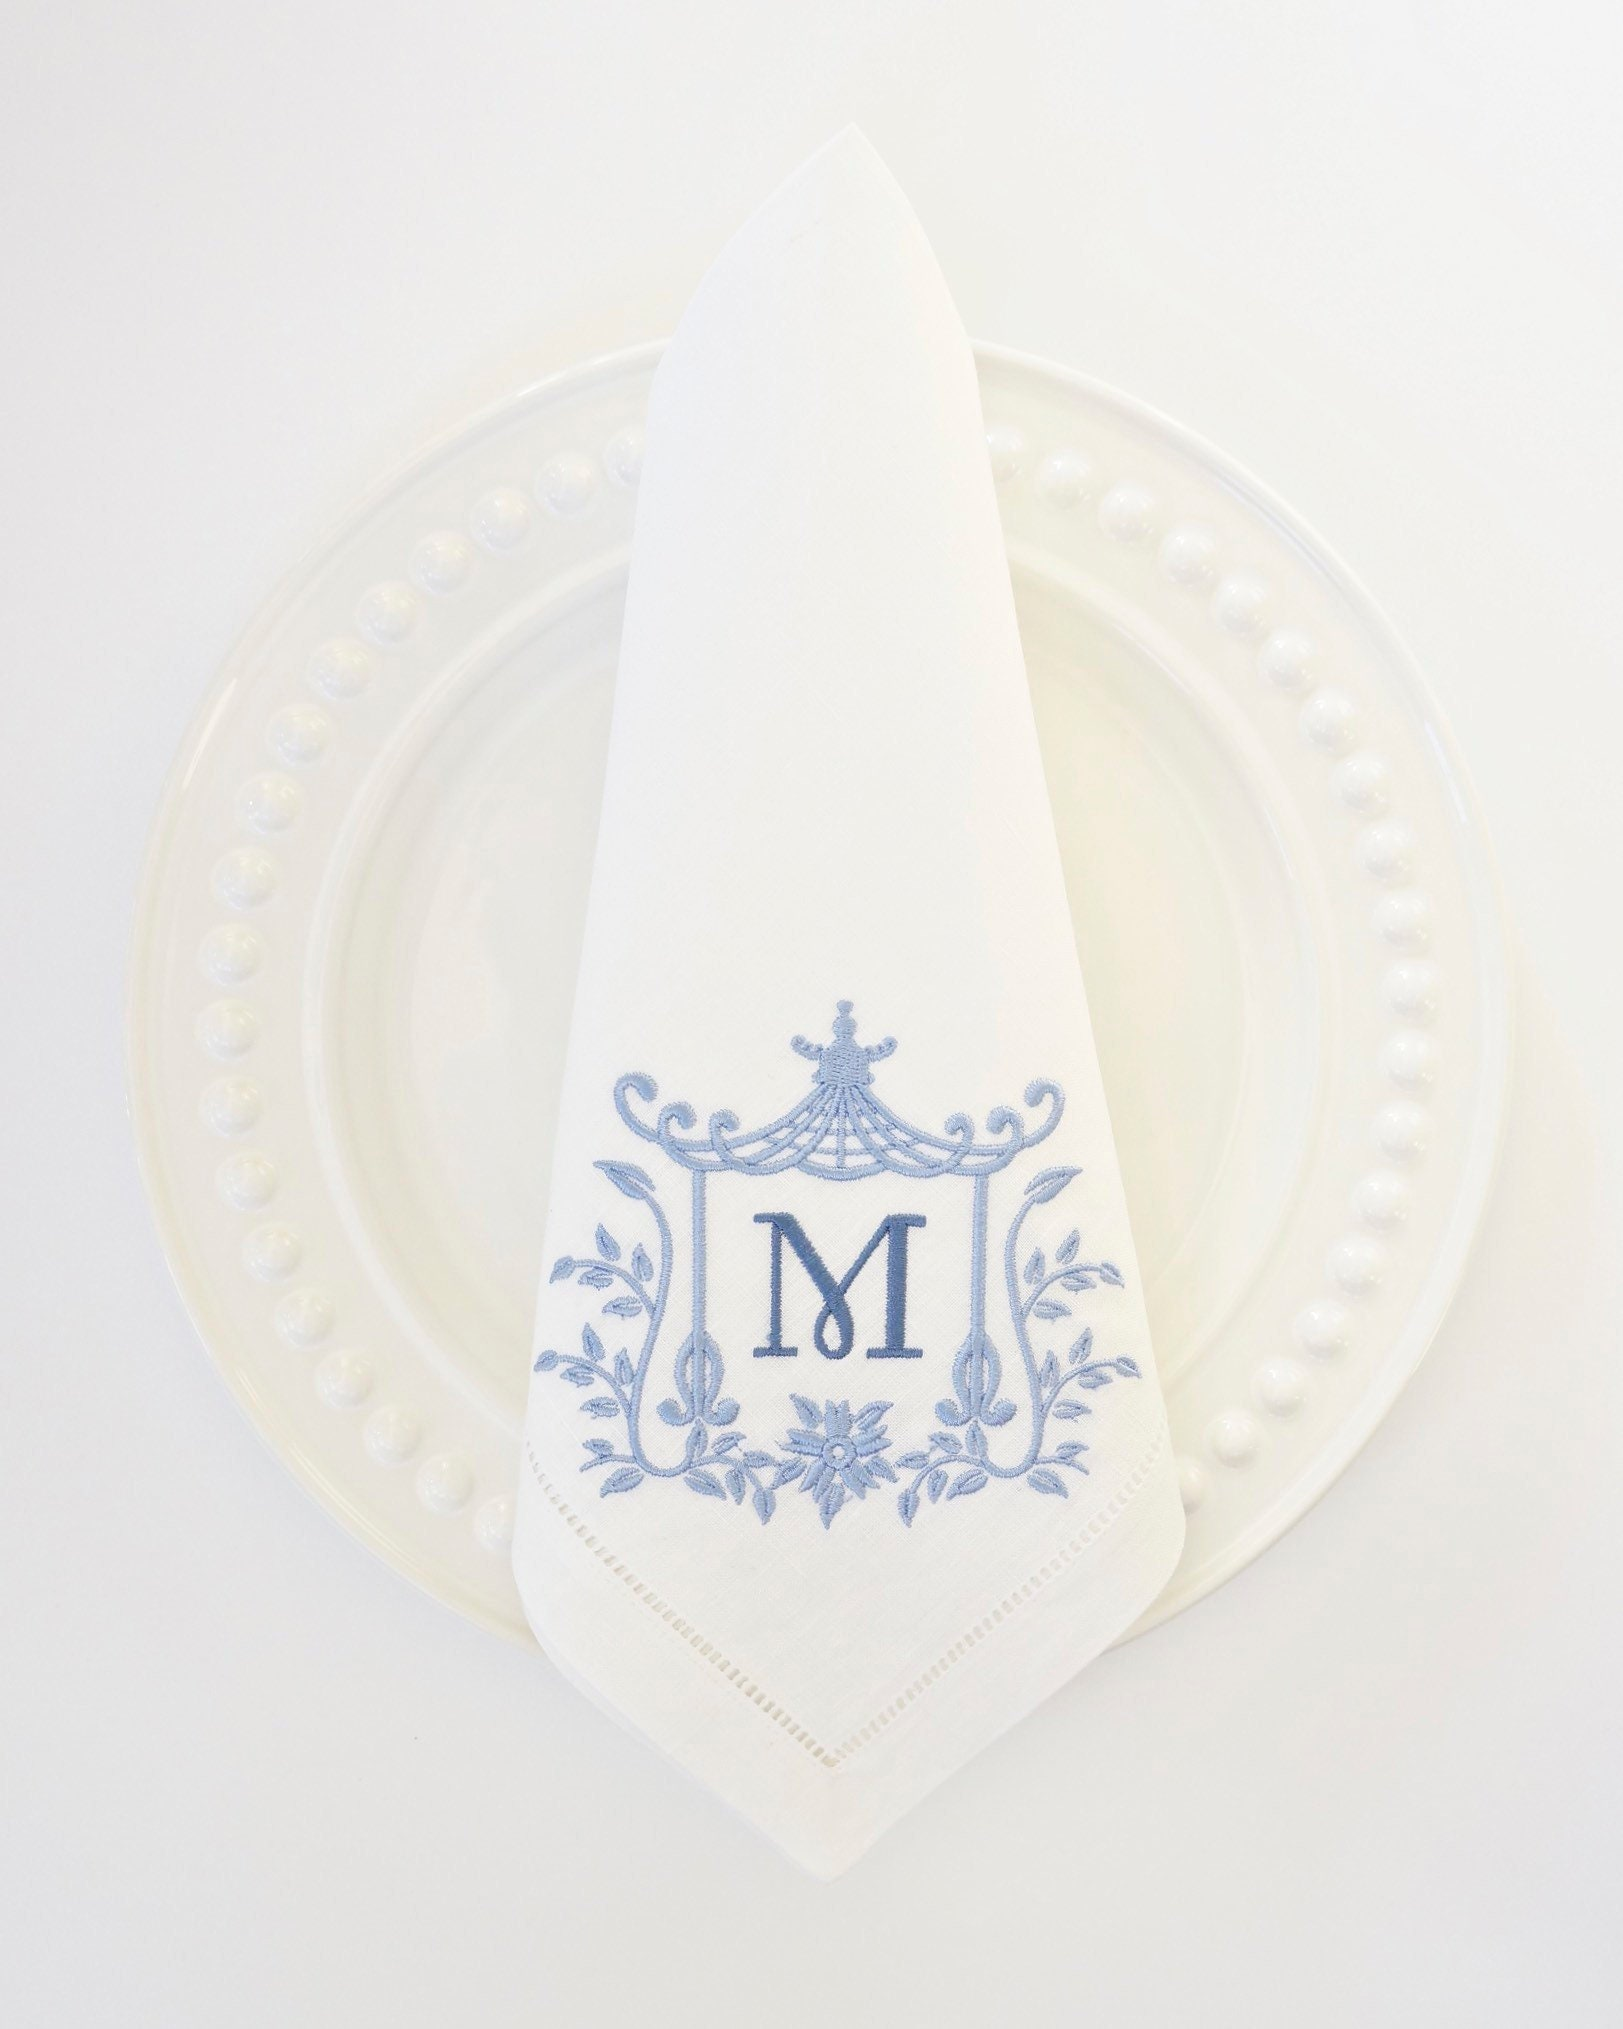 Monogrammed Napkins Pagoda Iv Font Monogrammed White Linen Dinner Napkins Wedding Or Hostess Gift Monogrammed Cotton Napkins